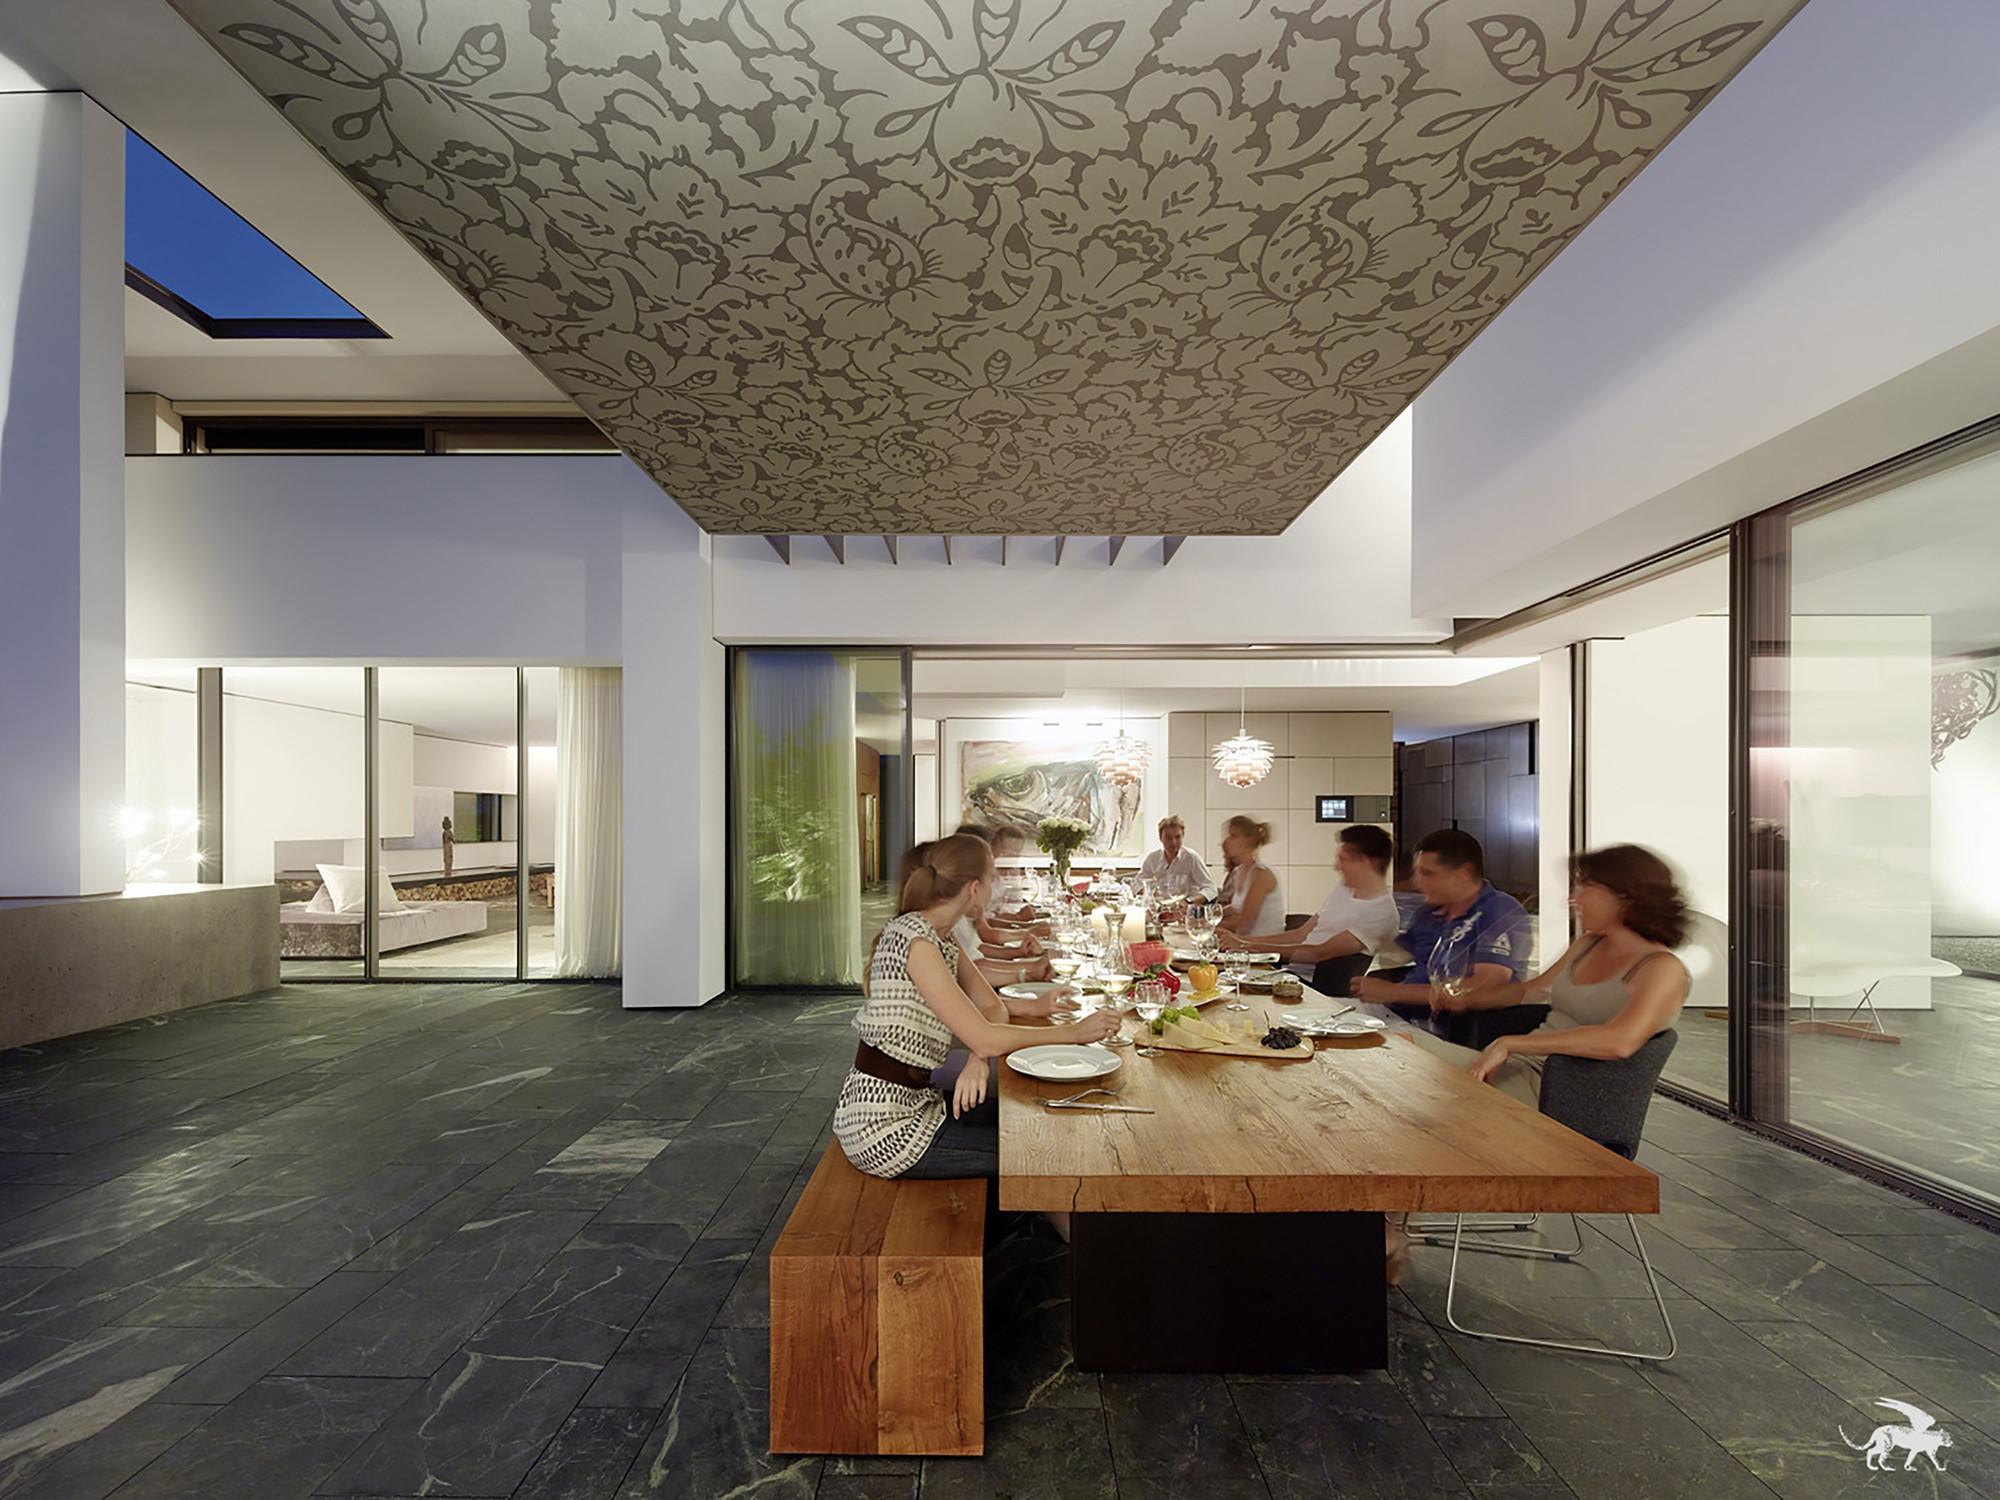 galeria de casa su alexander brenner architects 7. Black Bedroom Furniture Sets. Home Design Ideas